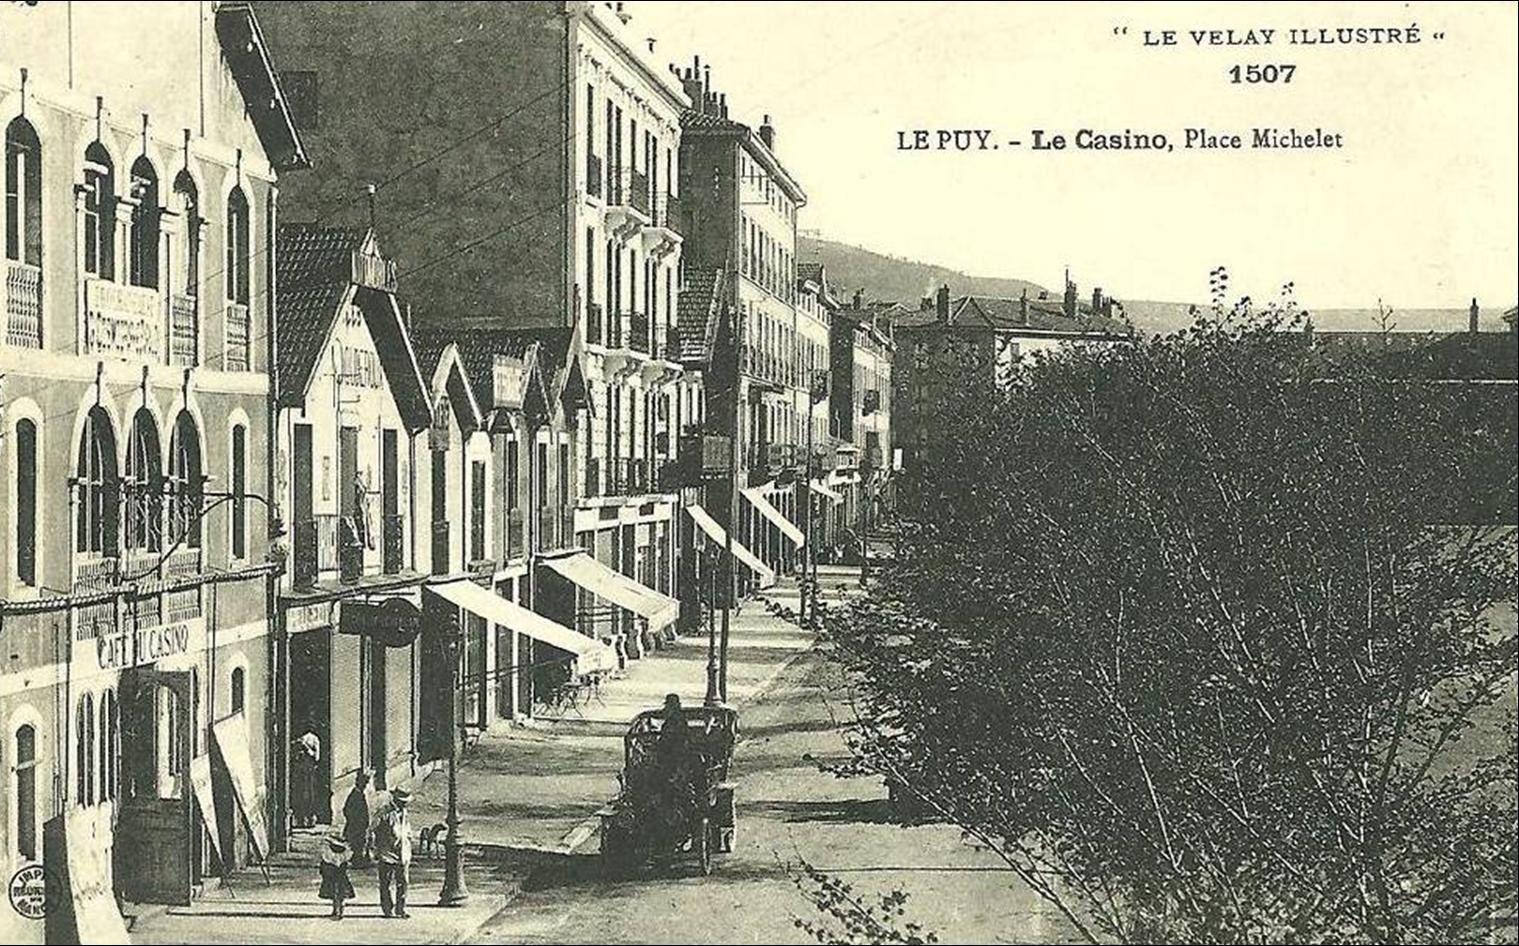 Les vitrines du Puy en Velay